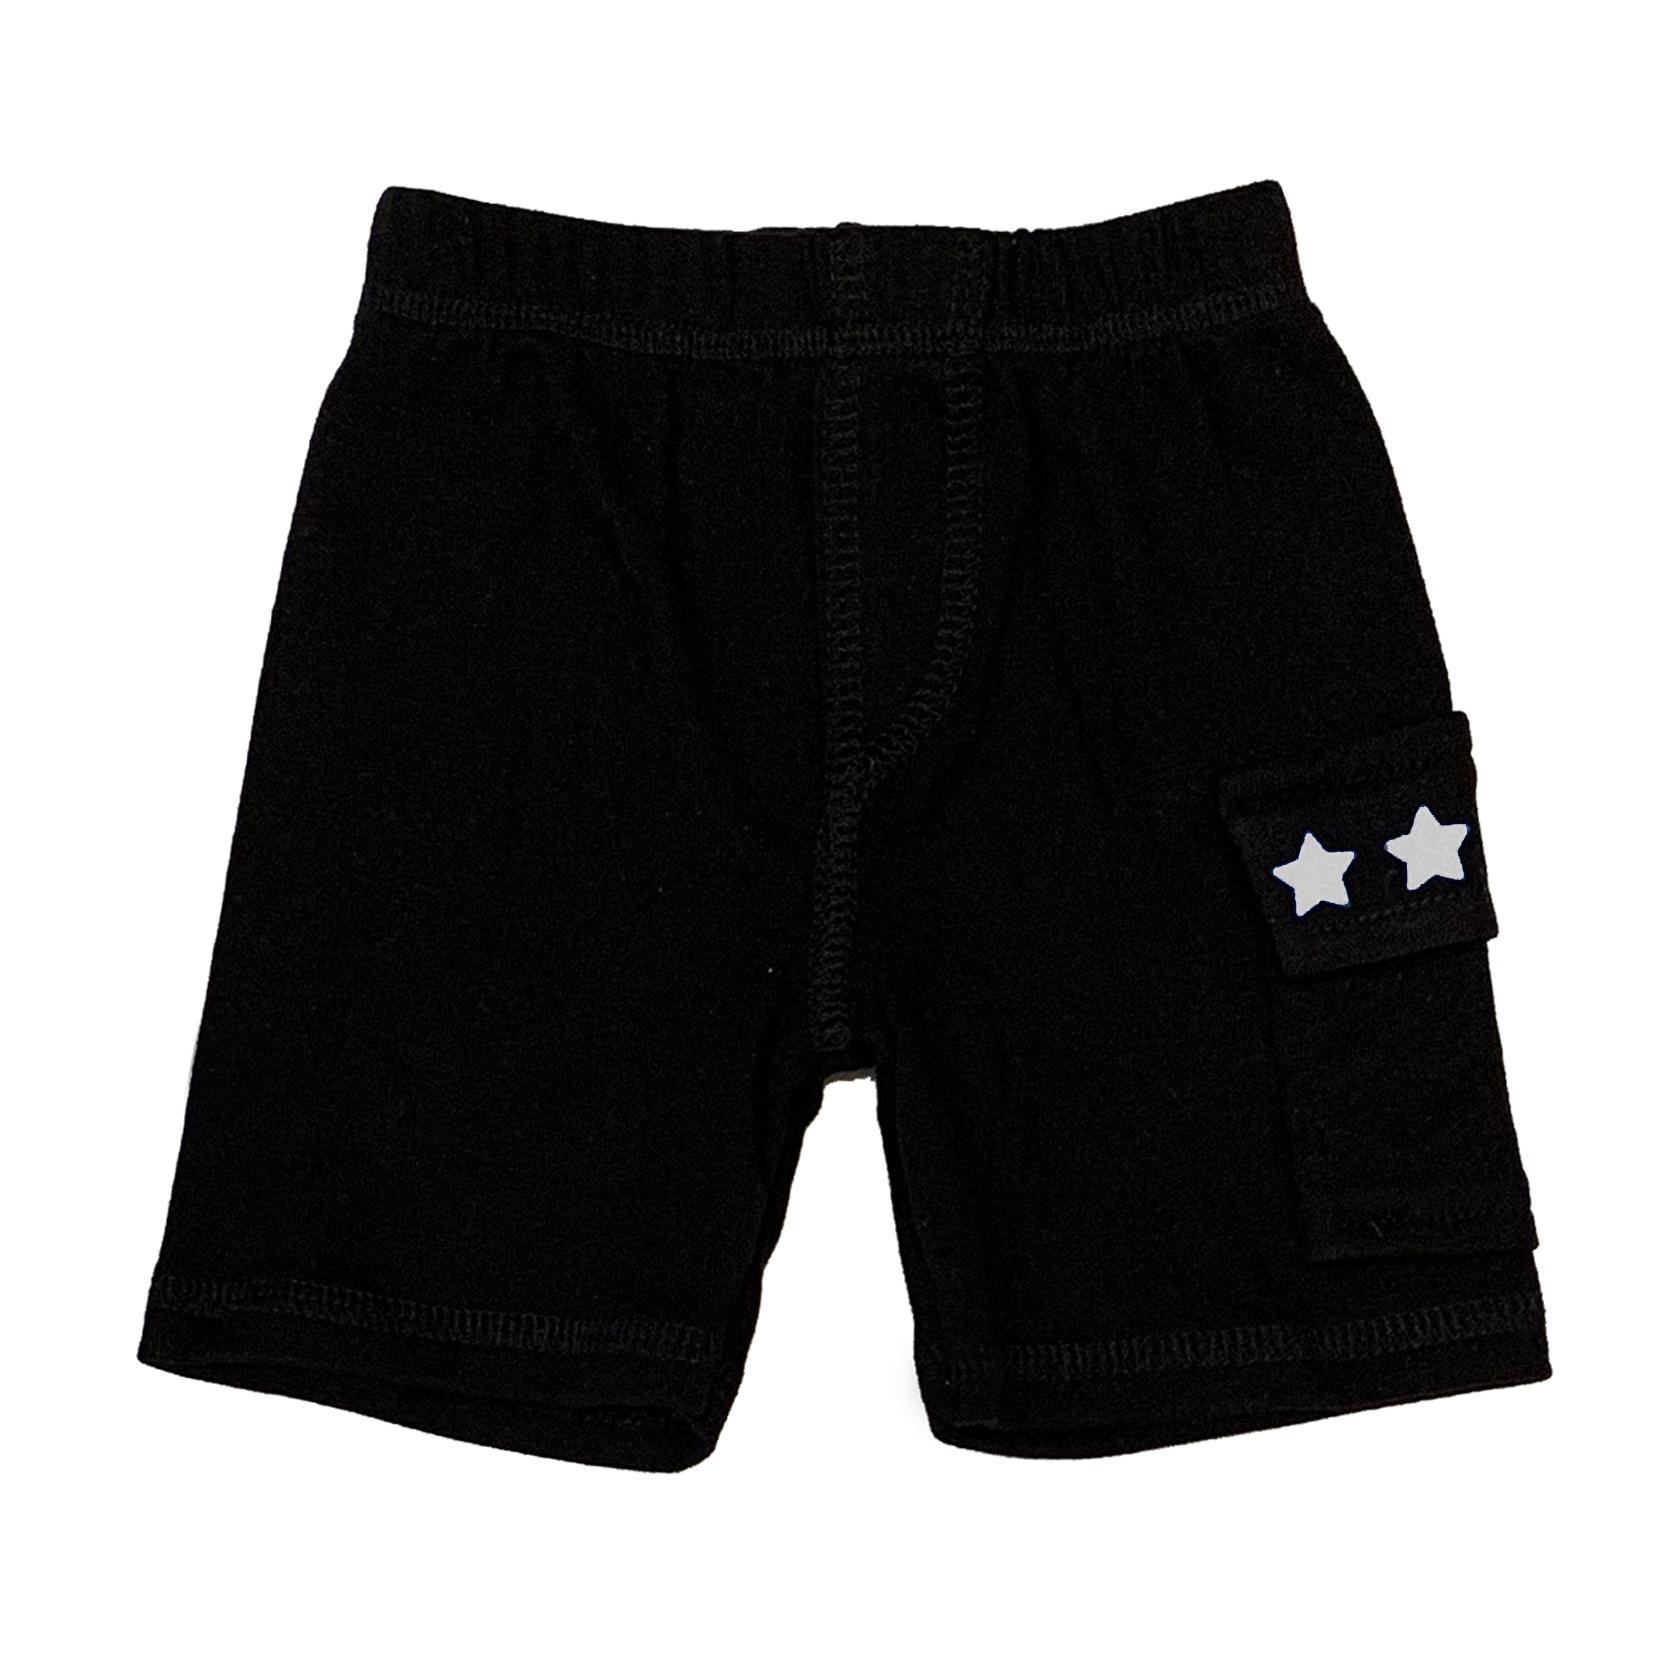 Small Change White Star Cargo Shorts